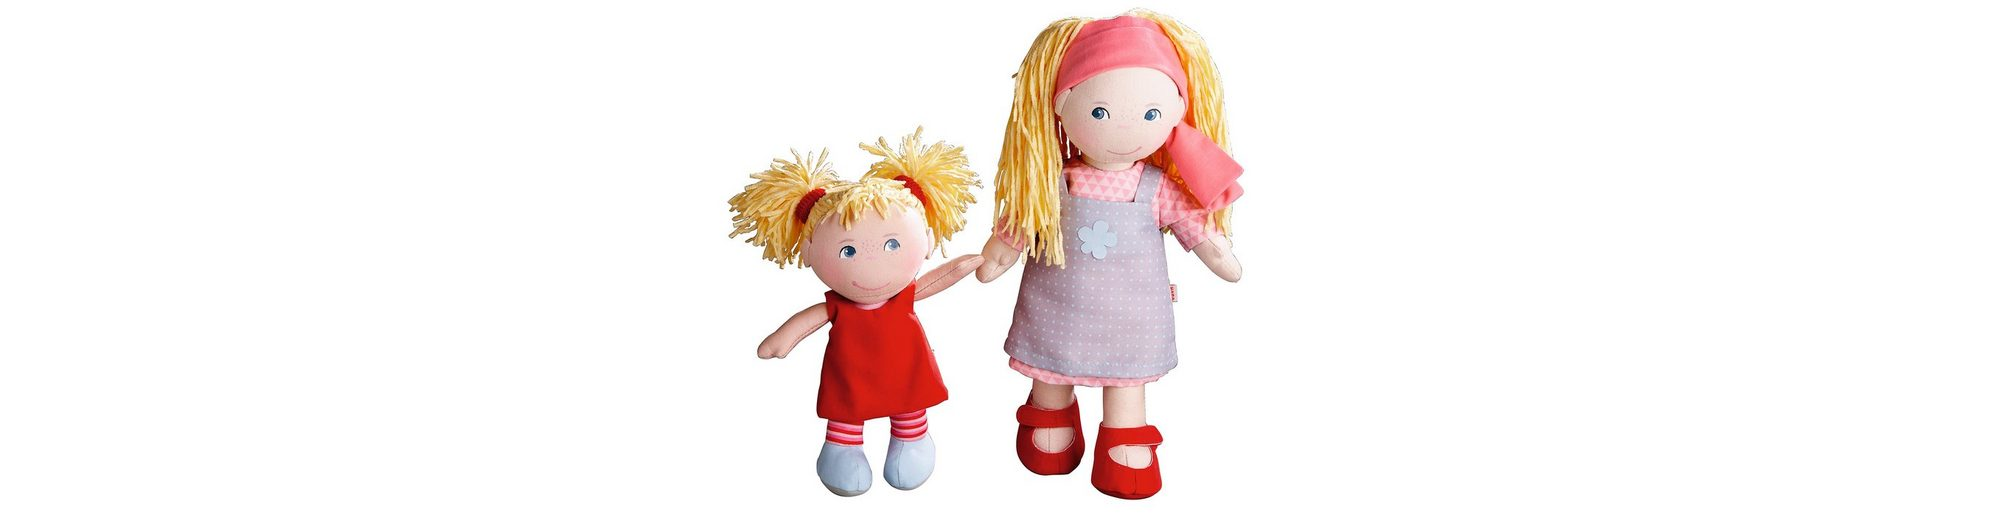 HABA® Puppen-Schwestern, »Lennja & Elin«